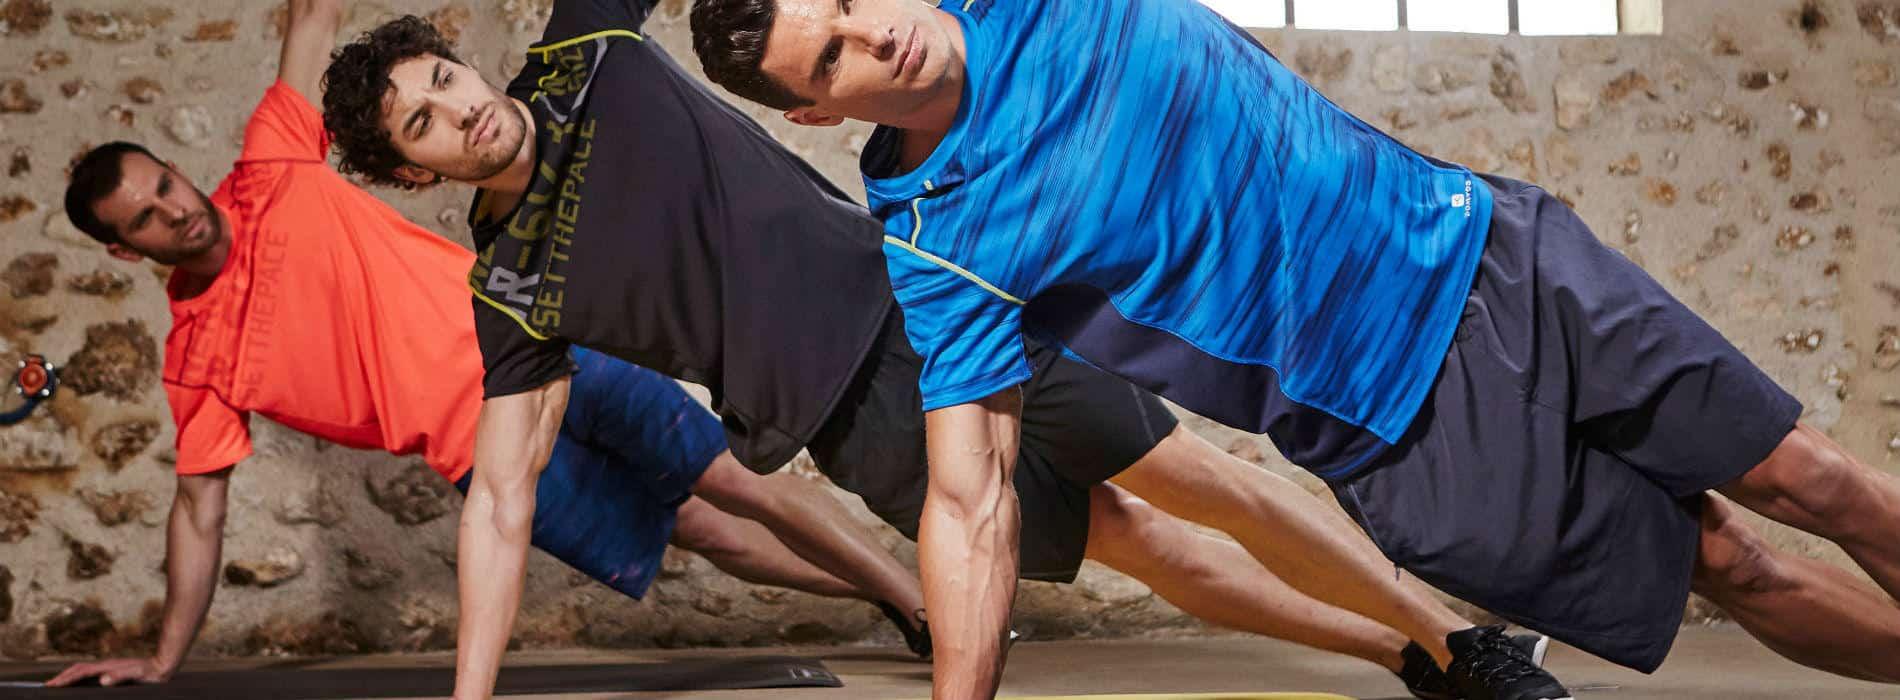 Weight Loss Tips for Men | Blog Decathlon